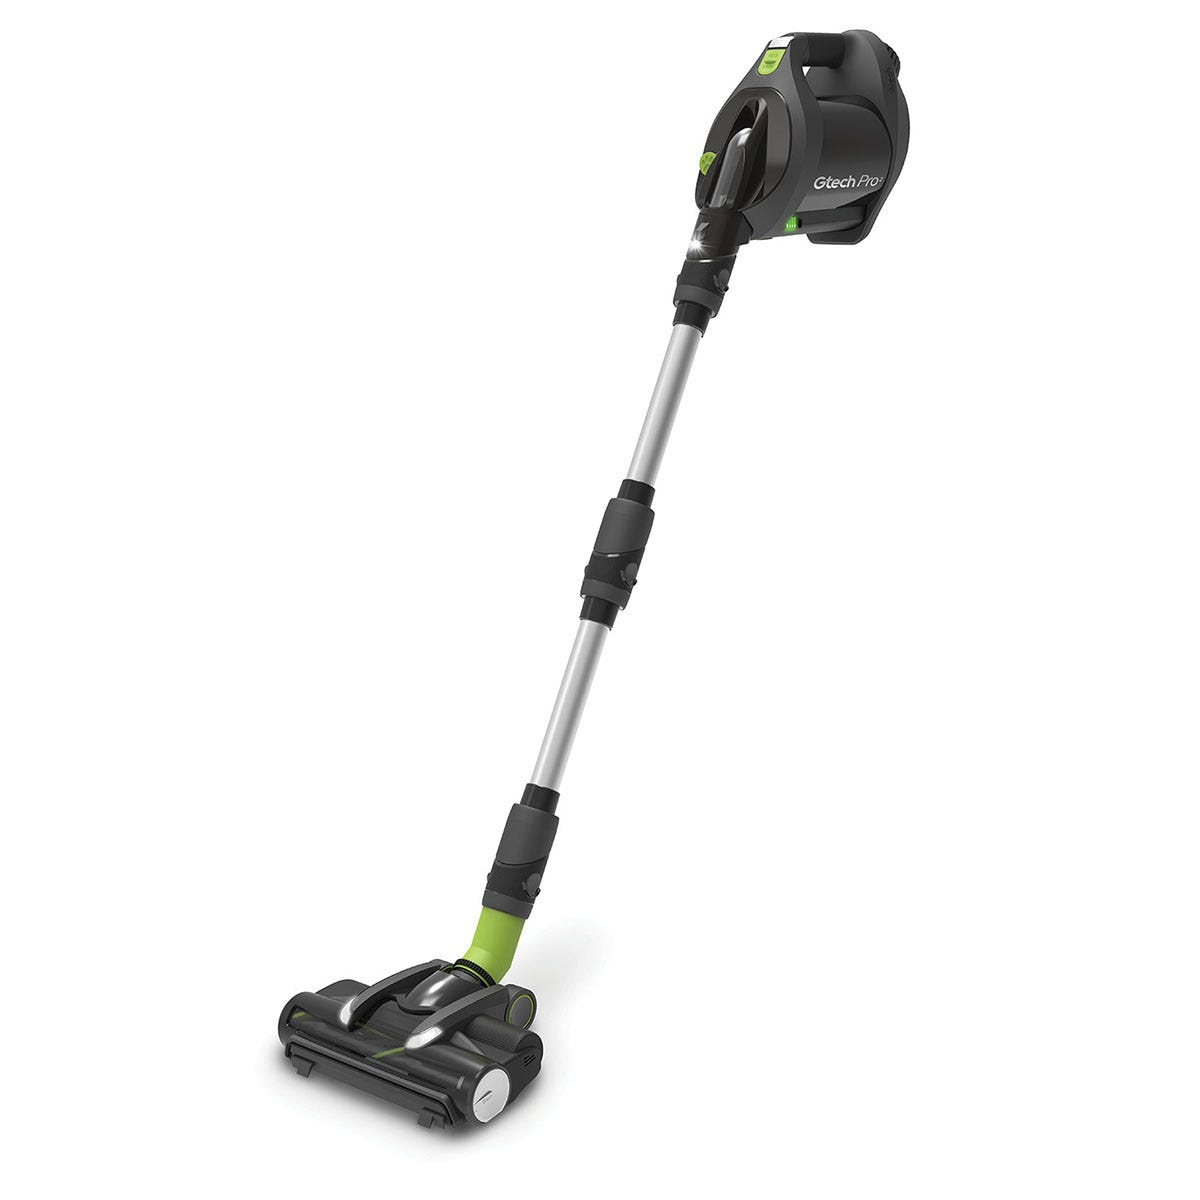 Gtech 1-03-224 Pro2 K9 Vacuum Cleaner - Black & Green